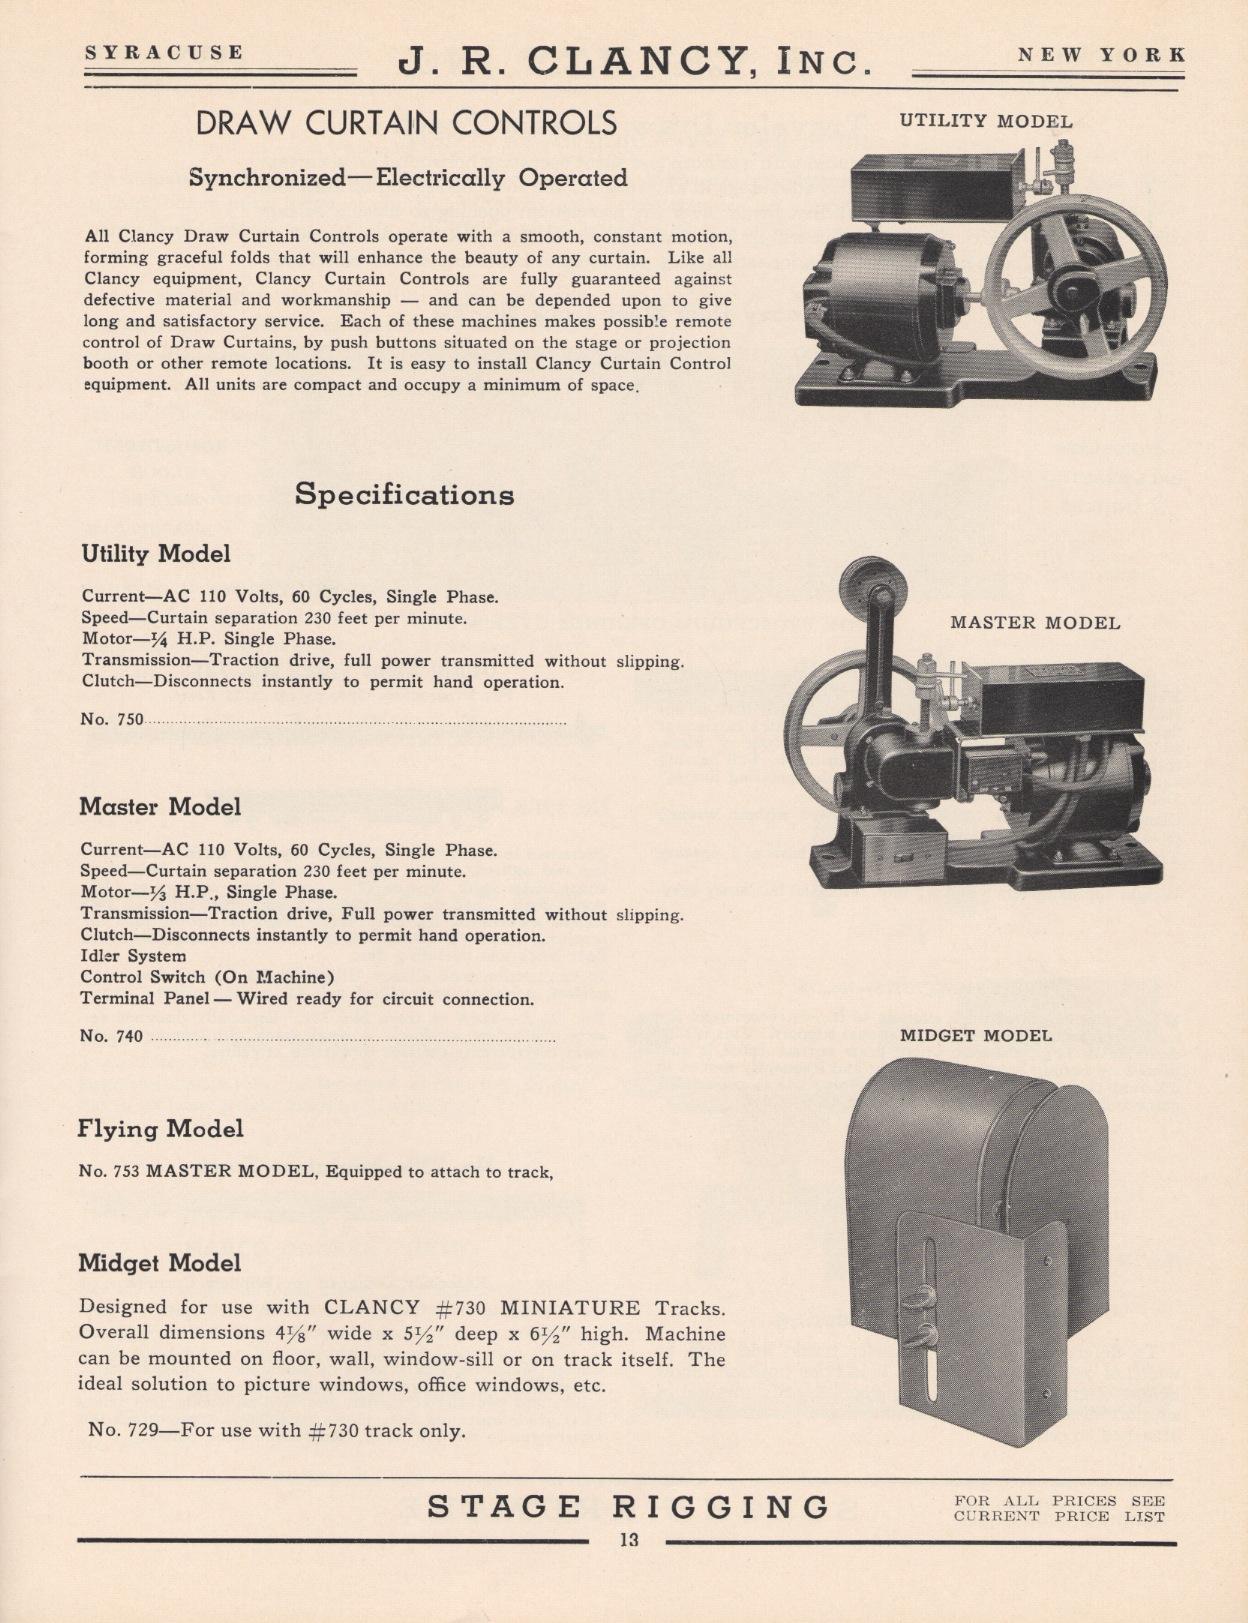 jrclancyarchive usitt org - /c52 1960/